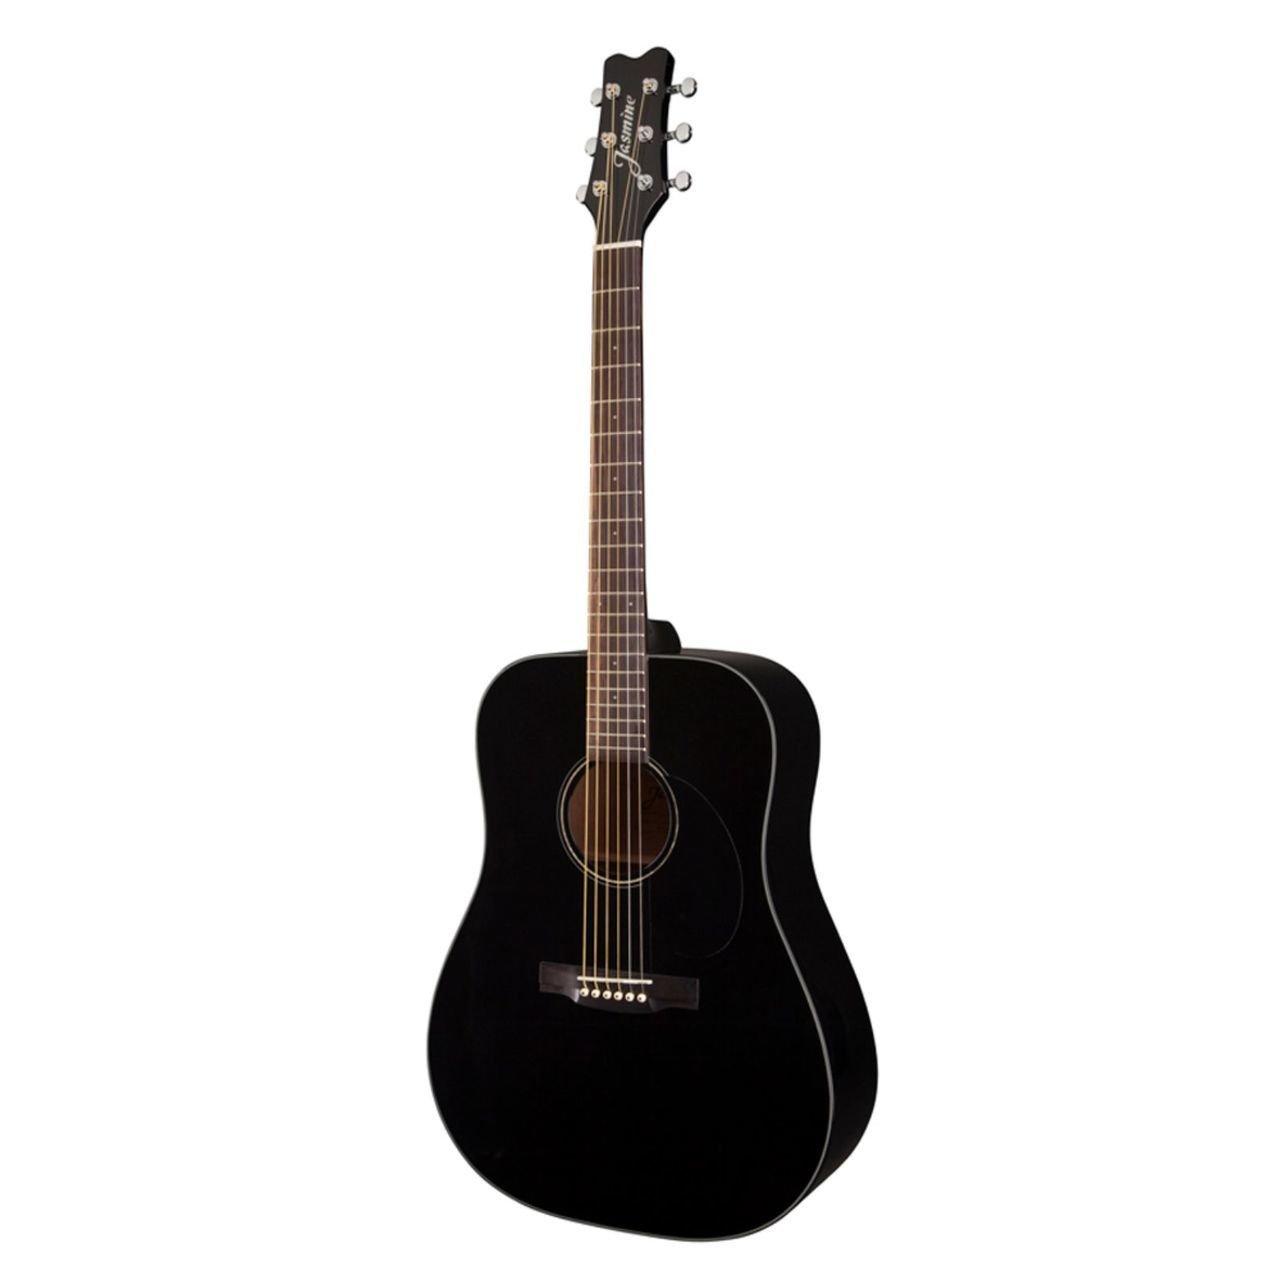 Jasmine JD39 Dreadnought Acoustic Guitar - Black